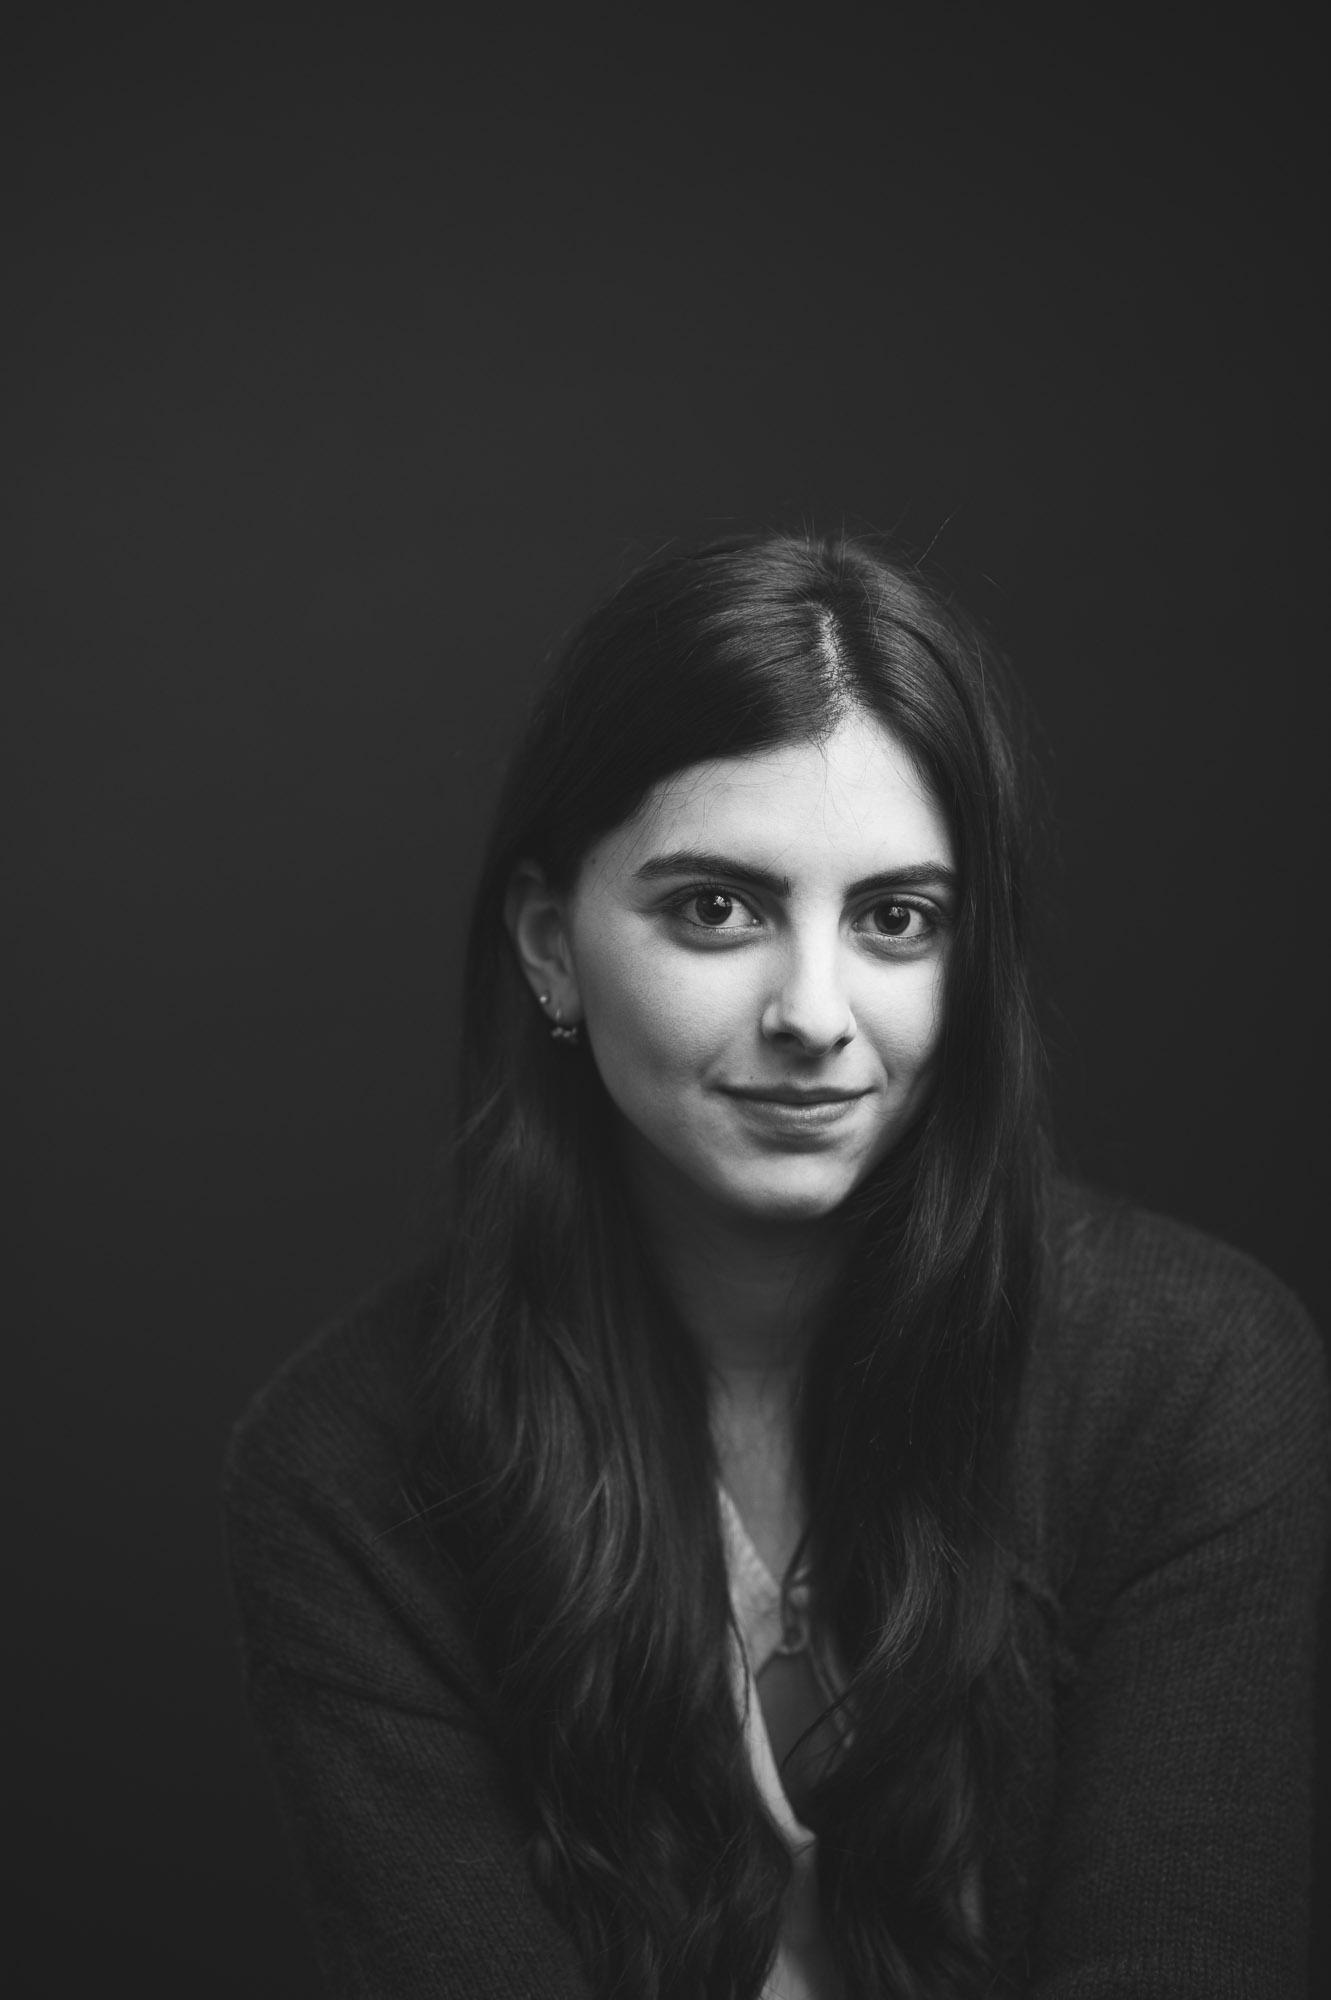 black-and-white-studio-headshot-photographer-alex-tran